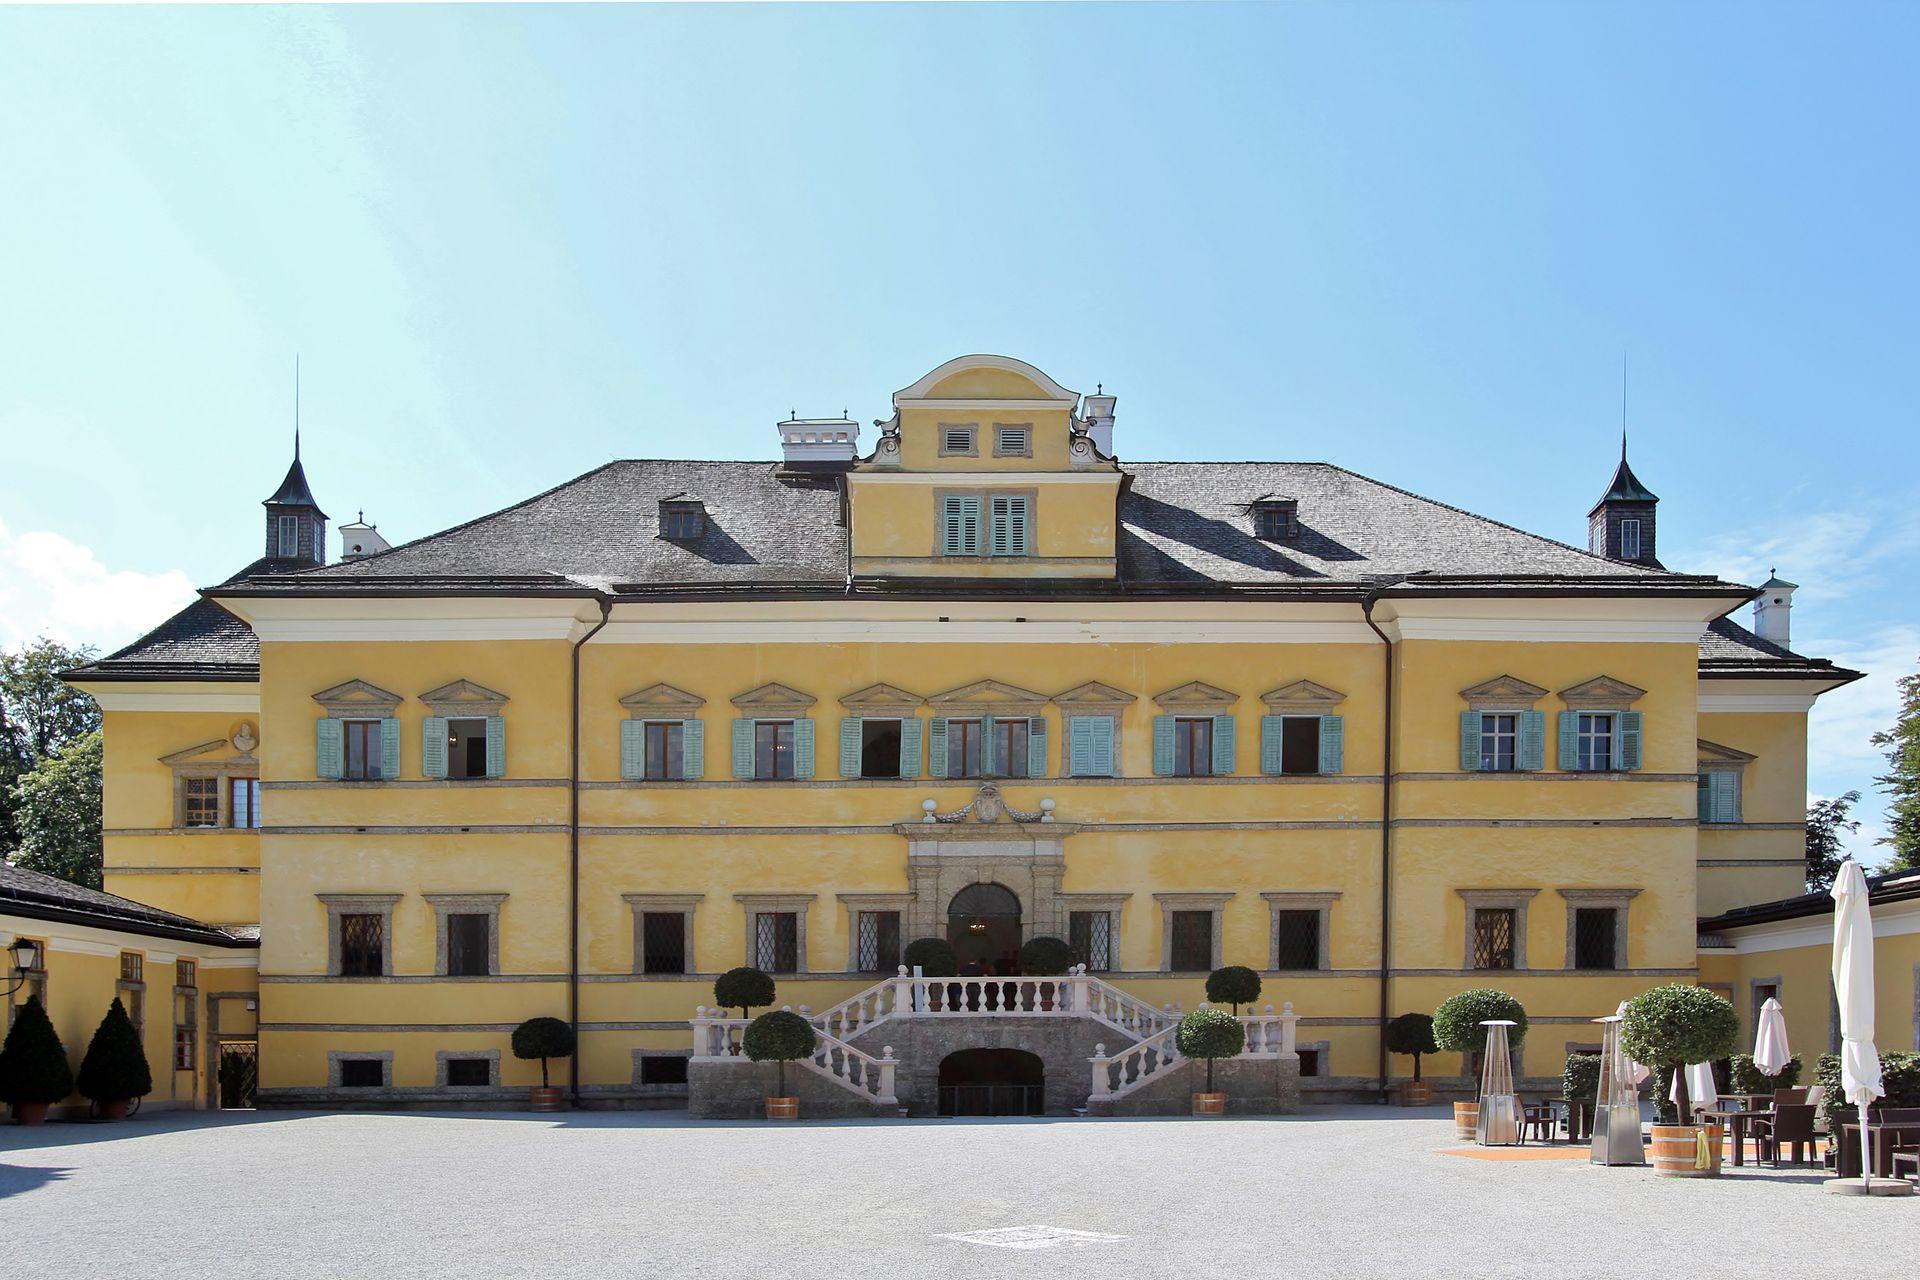 I C Villa Guardia Graduatoria D Istituto Iii Fascia